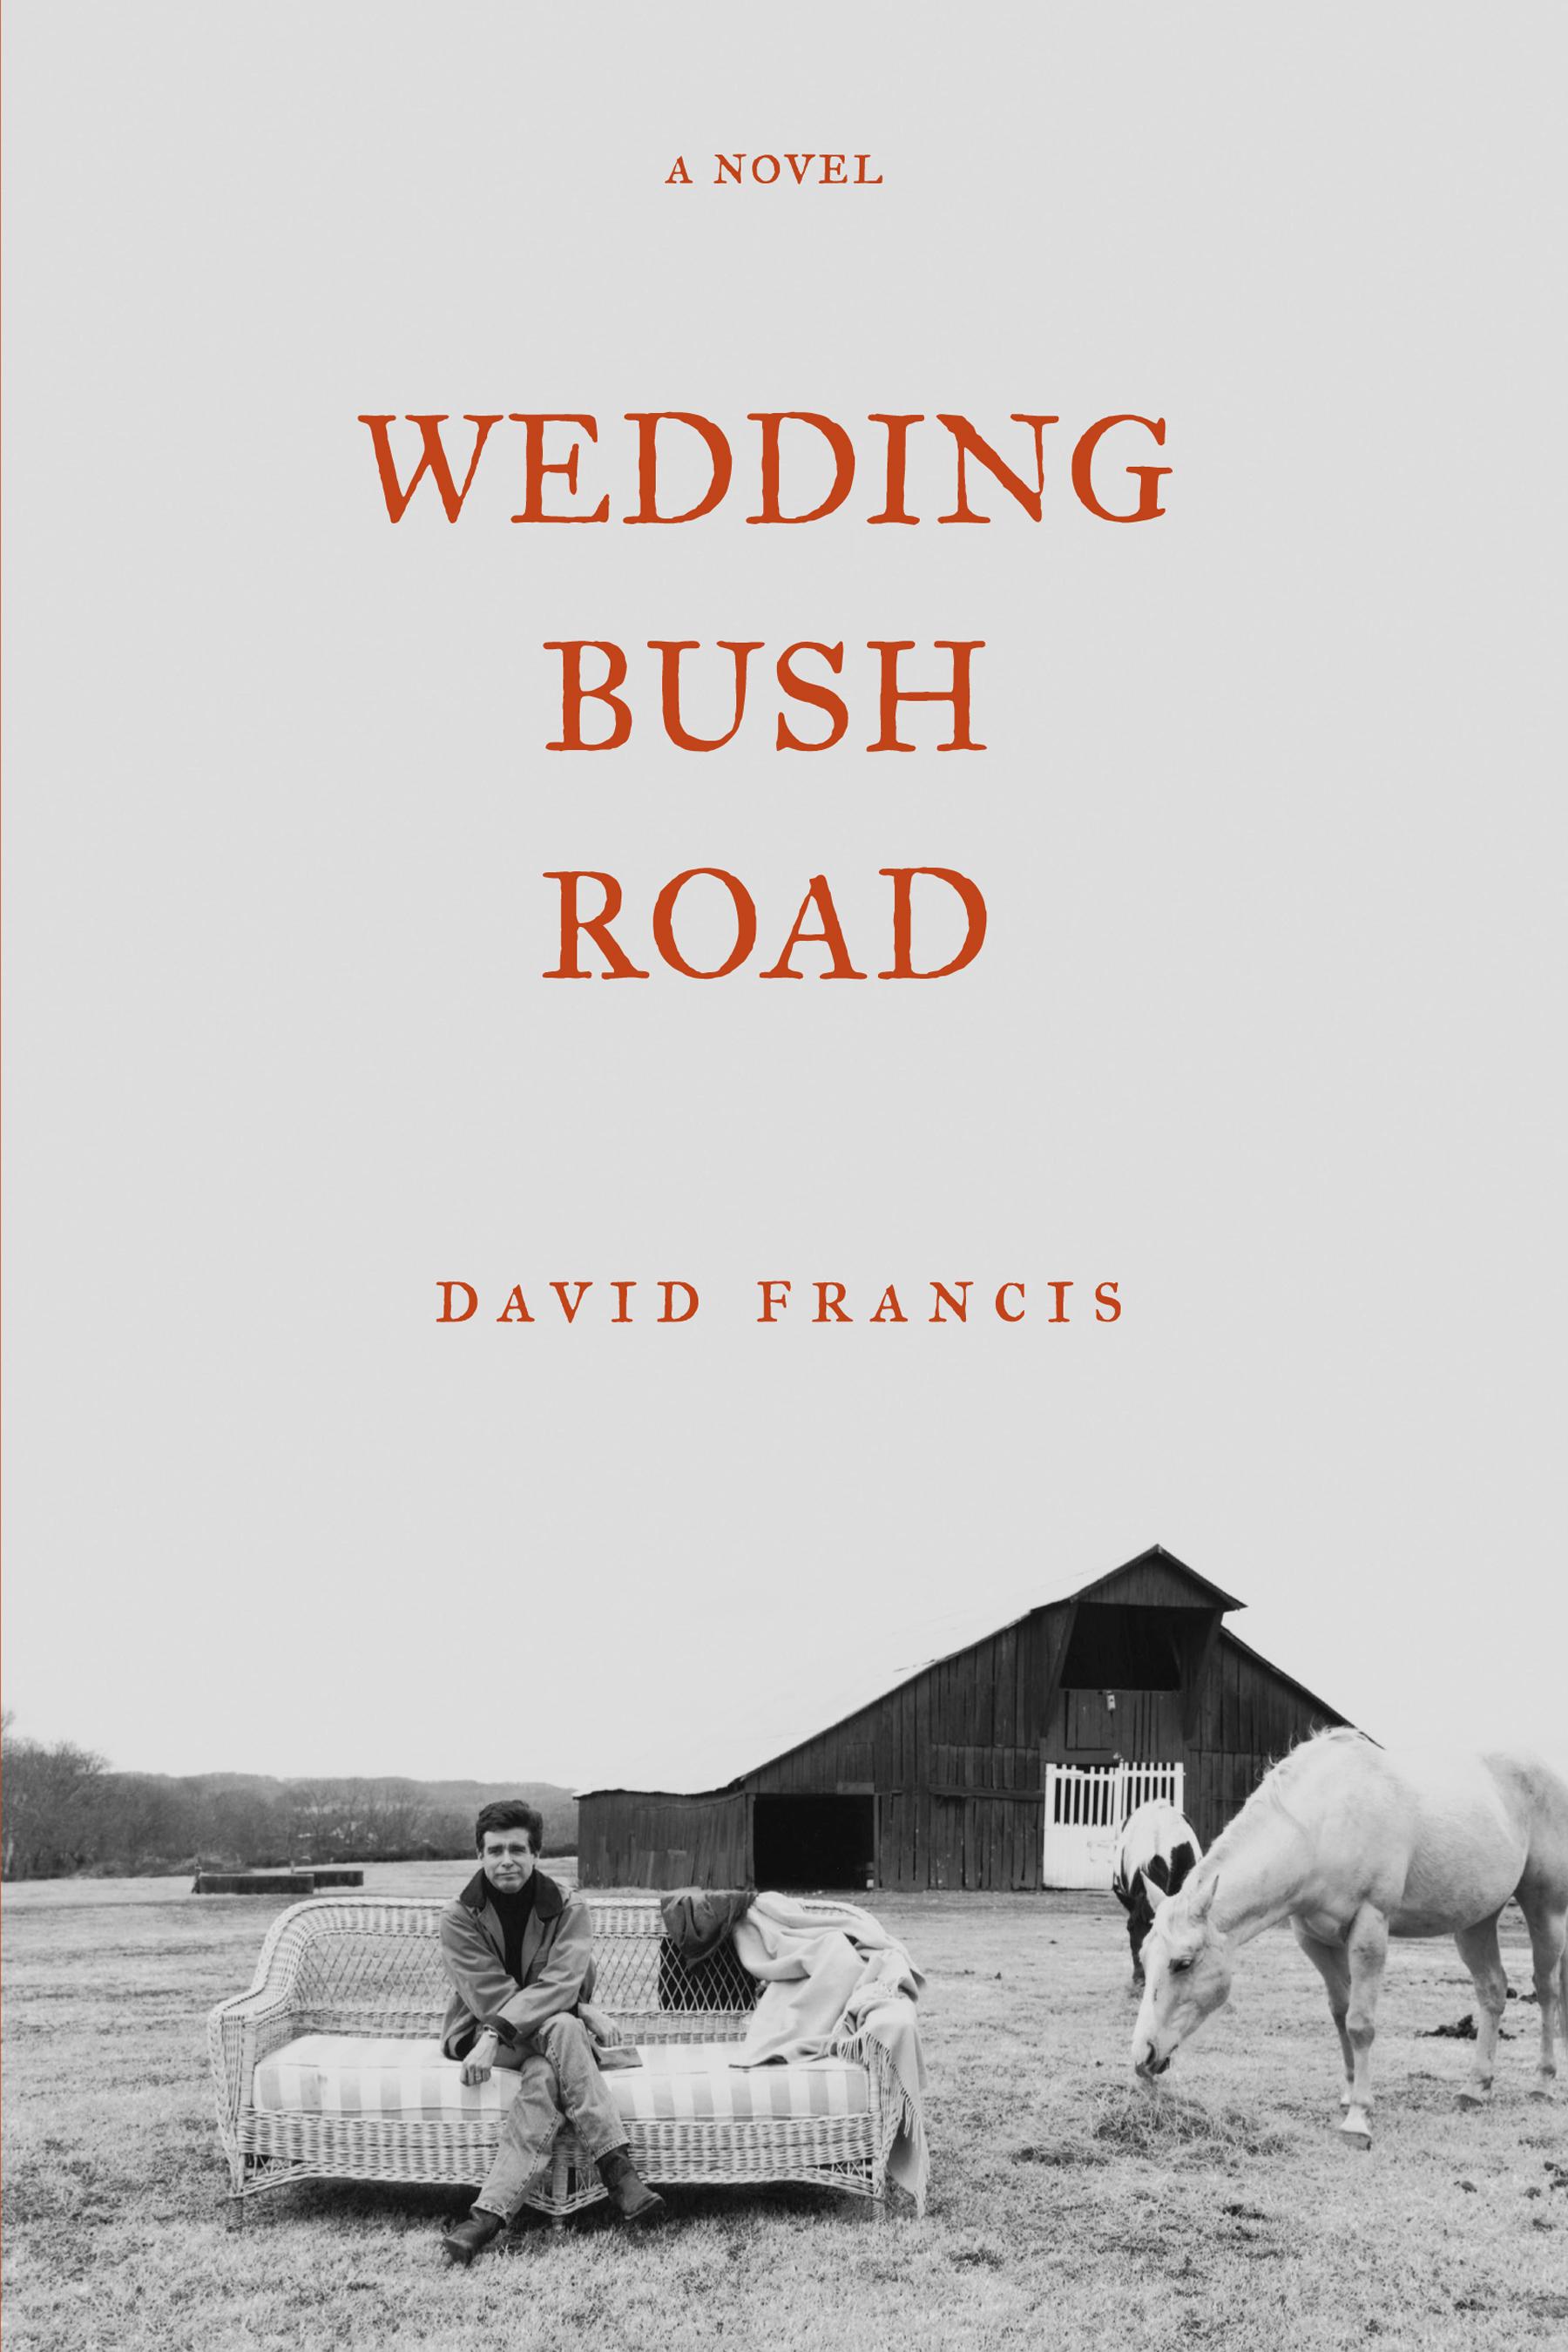 Drawn bush road  Bush Road Wedding